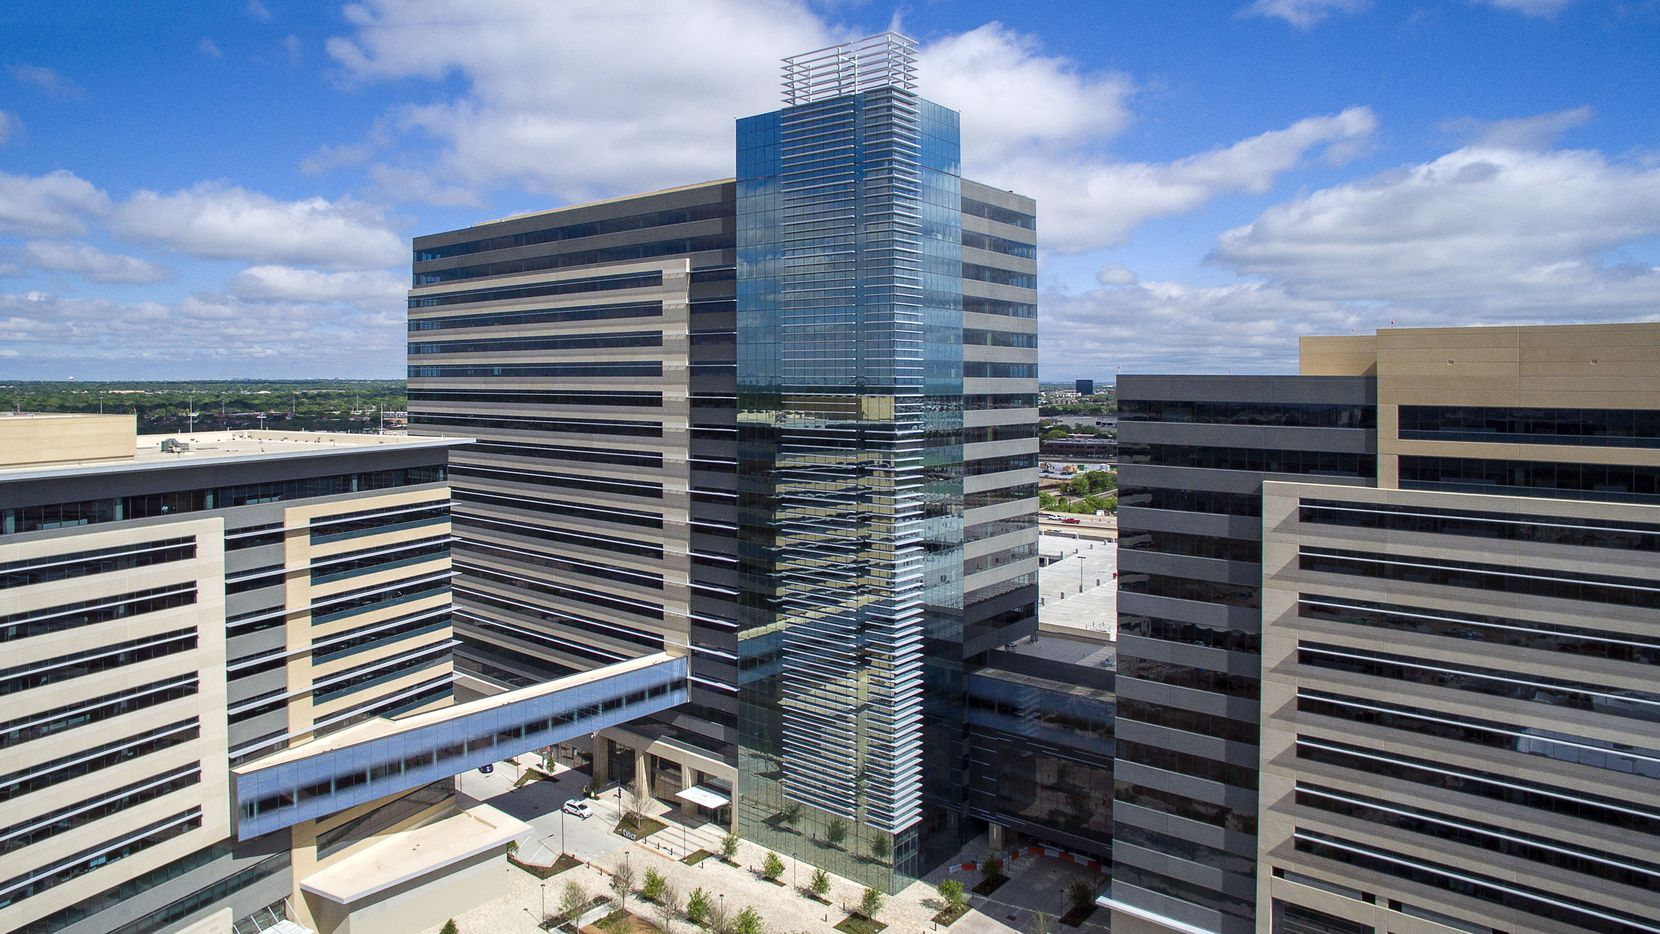 Developer KDC is seeking approvals for a 150-room hotel in its CityLine project.